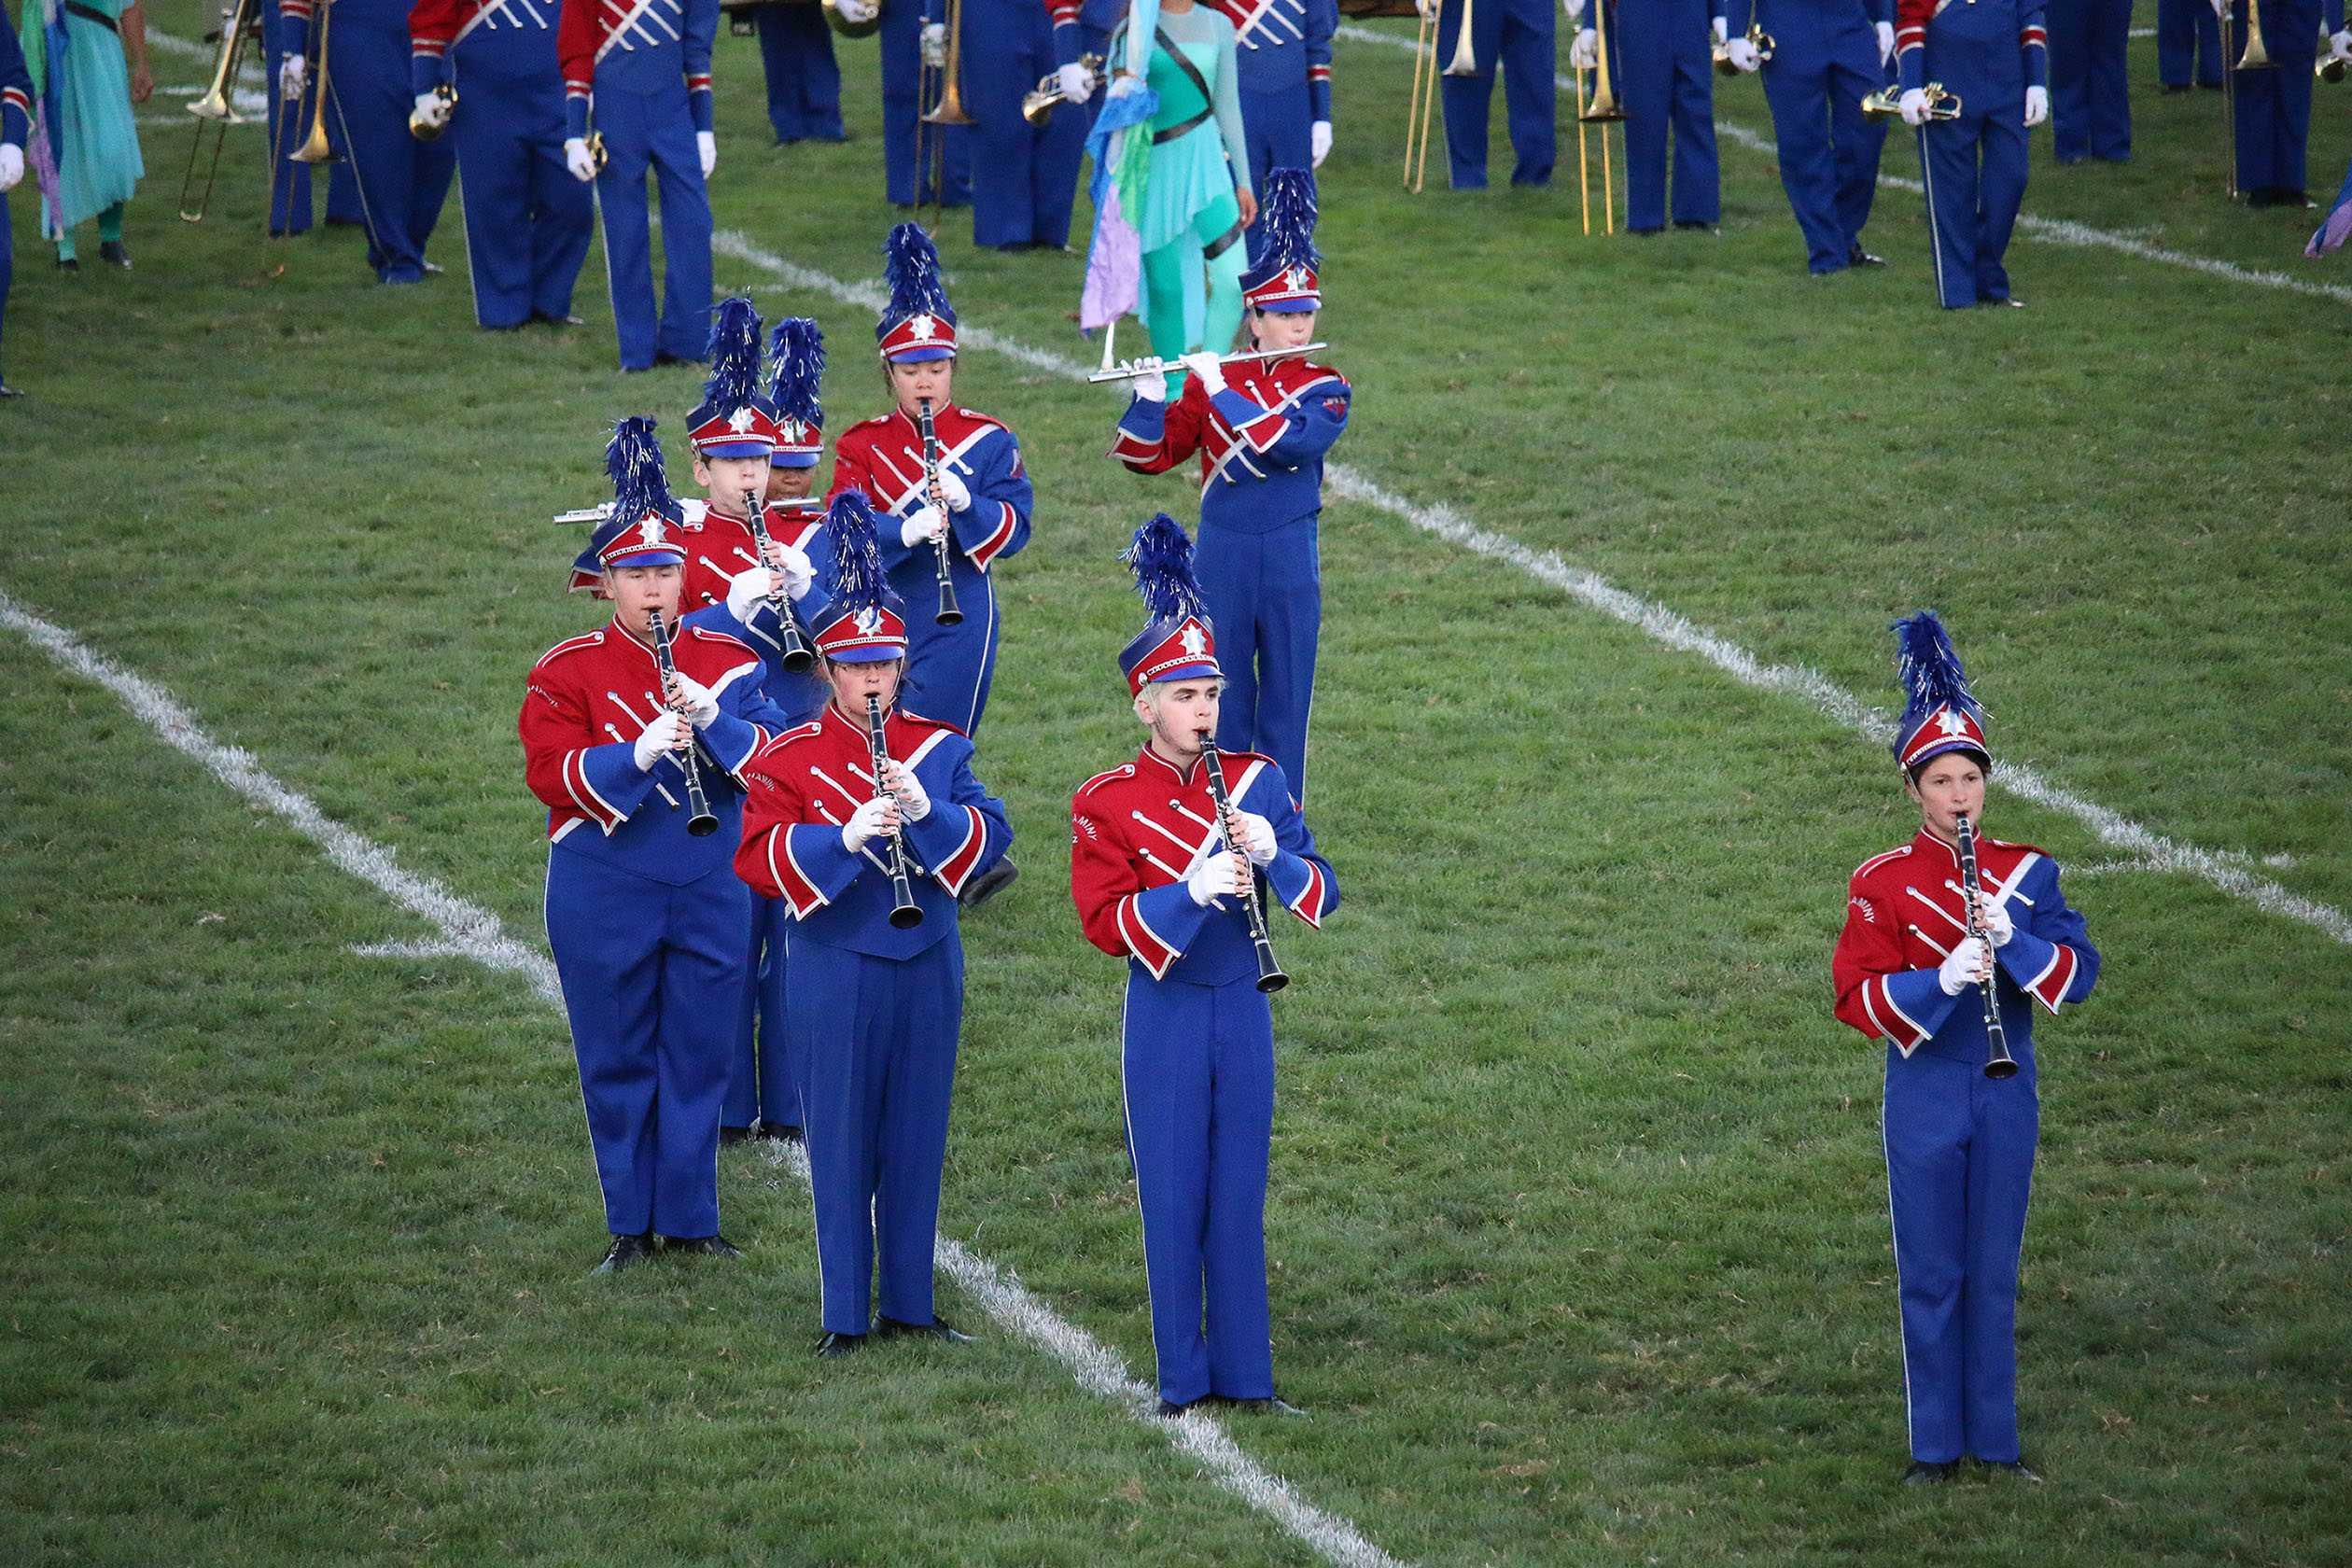 The Neshaminy band preforms on the field.